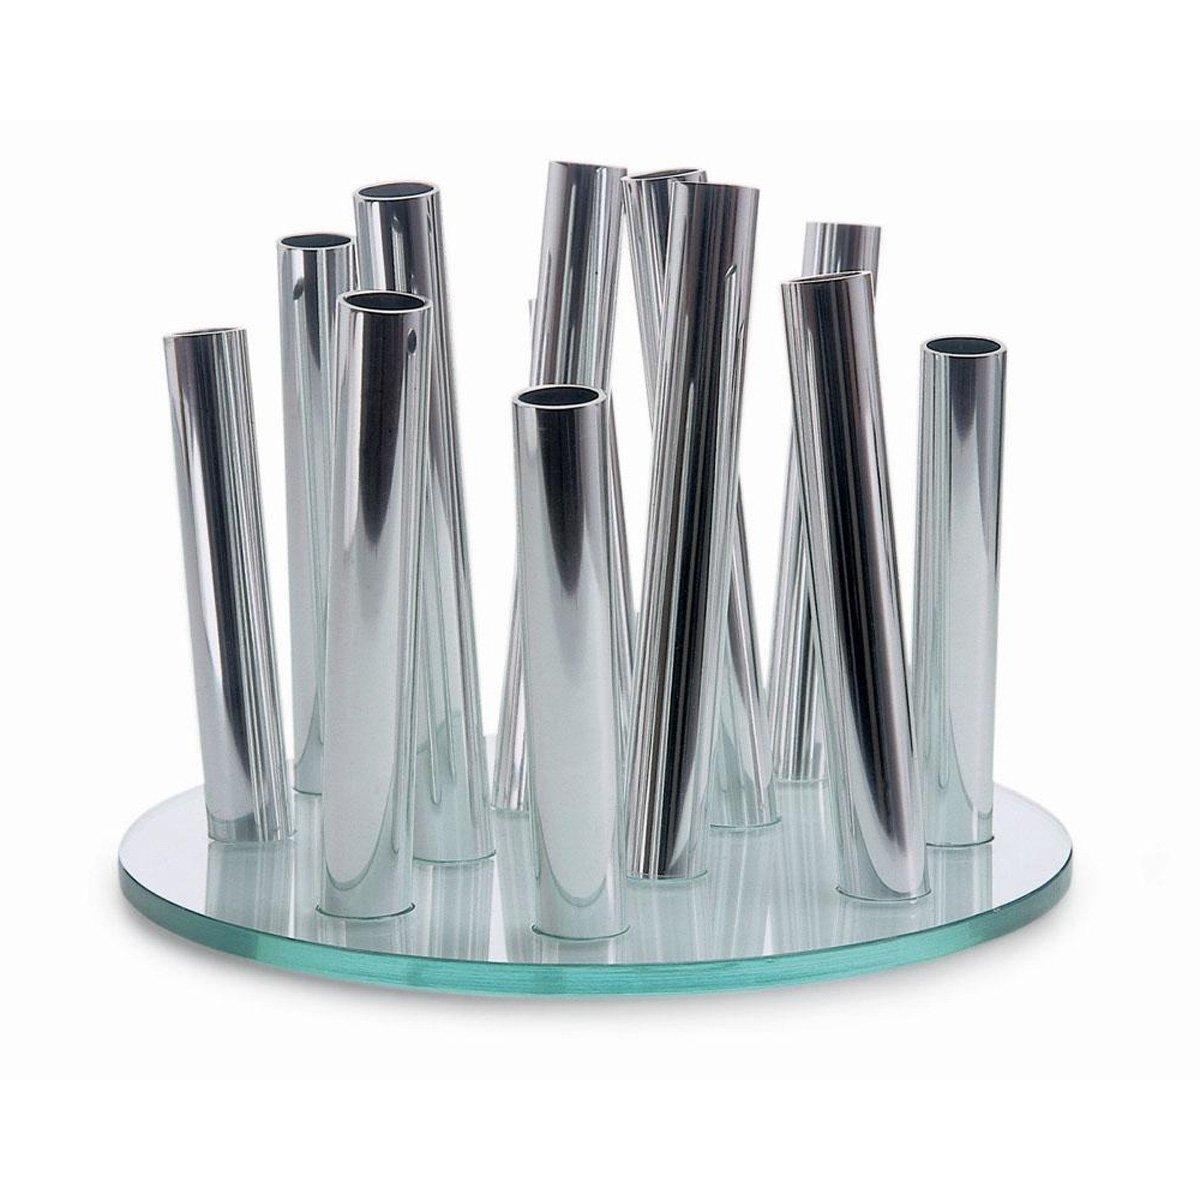 Philippi 123063 Bouquet Vase Glas und verchromtes verchromtes verchromtes Messing ø 24 cm d0bd0f